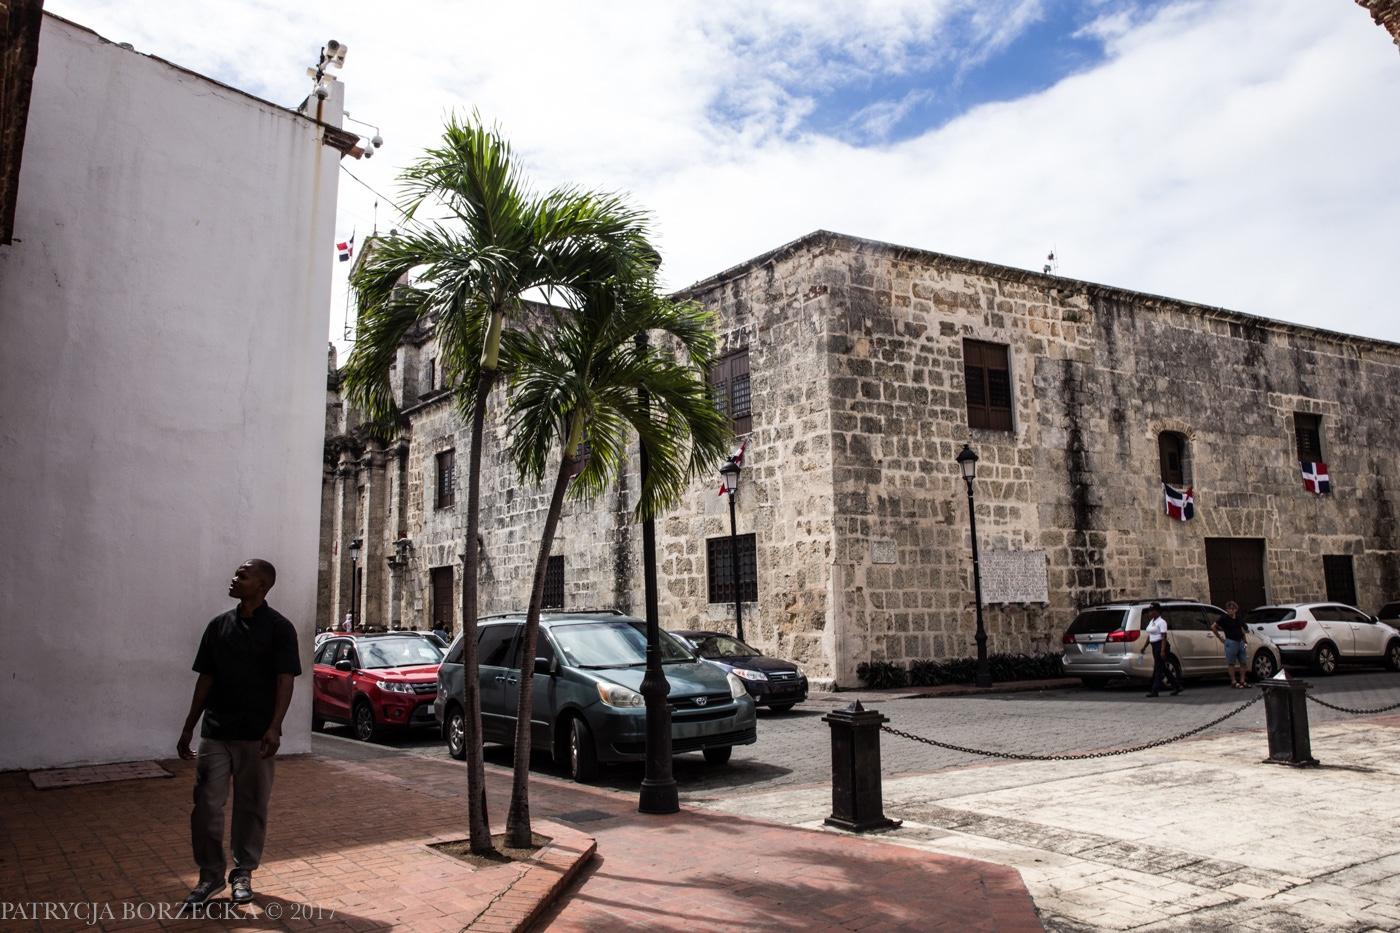 Patrycja-Borzecka-Photo-Santo-Domingo-Zona-Colonial-08